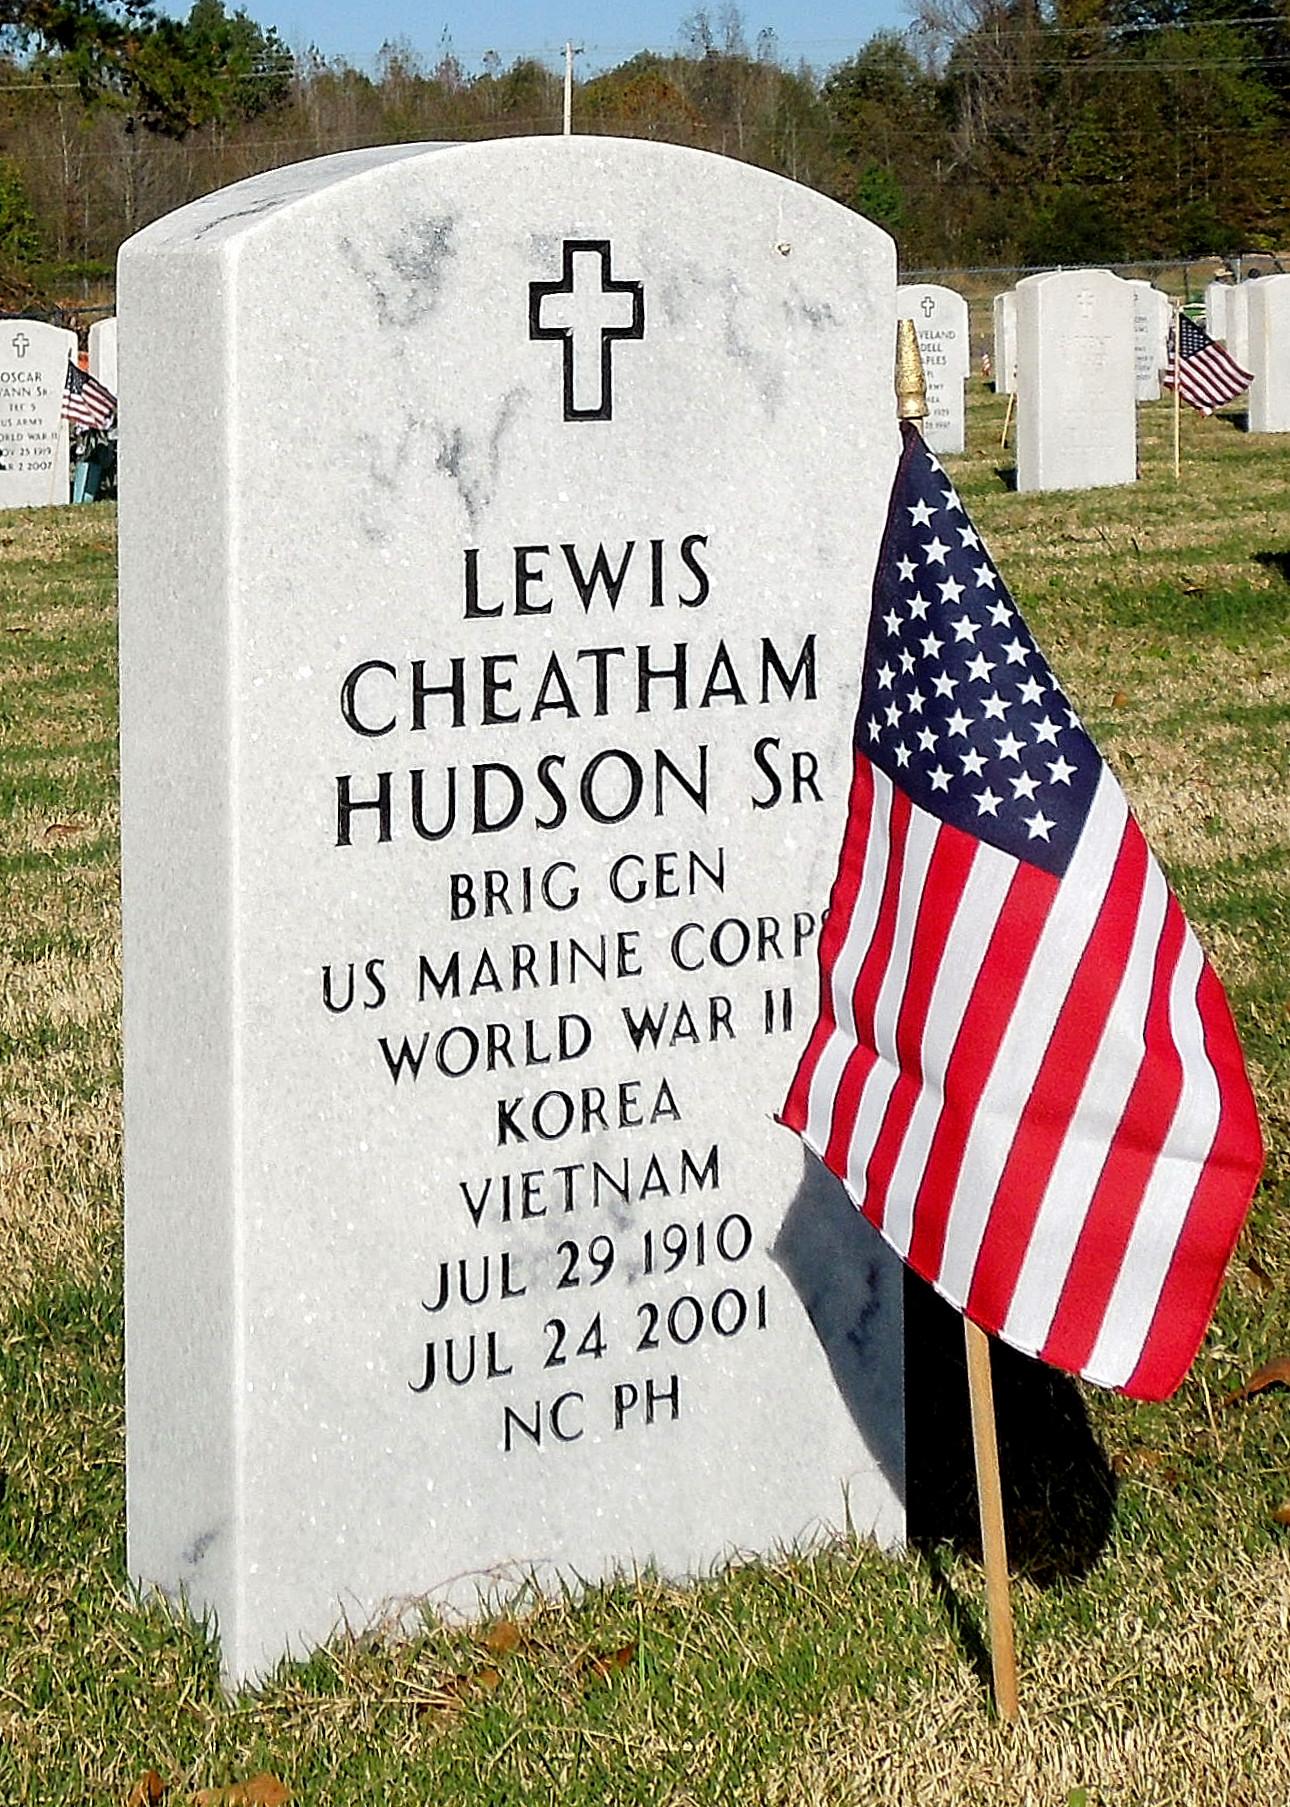 Lewis Cheatham Hudson, Sr